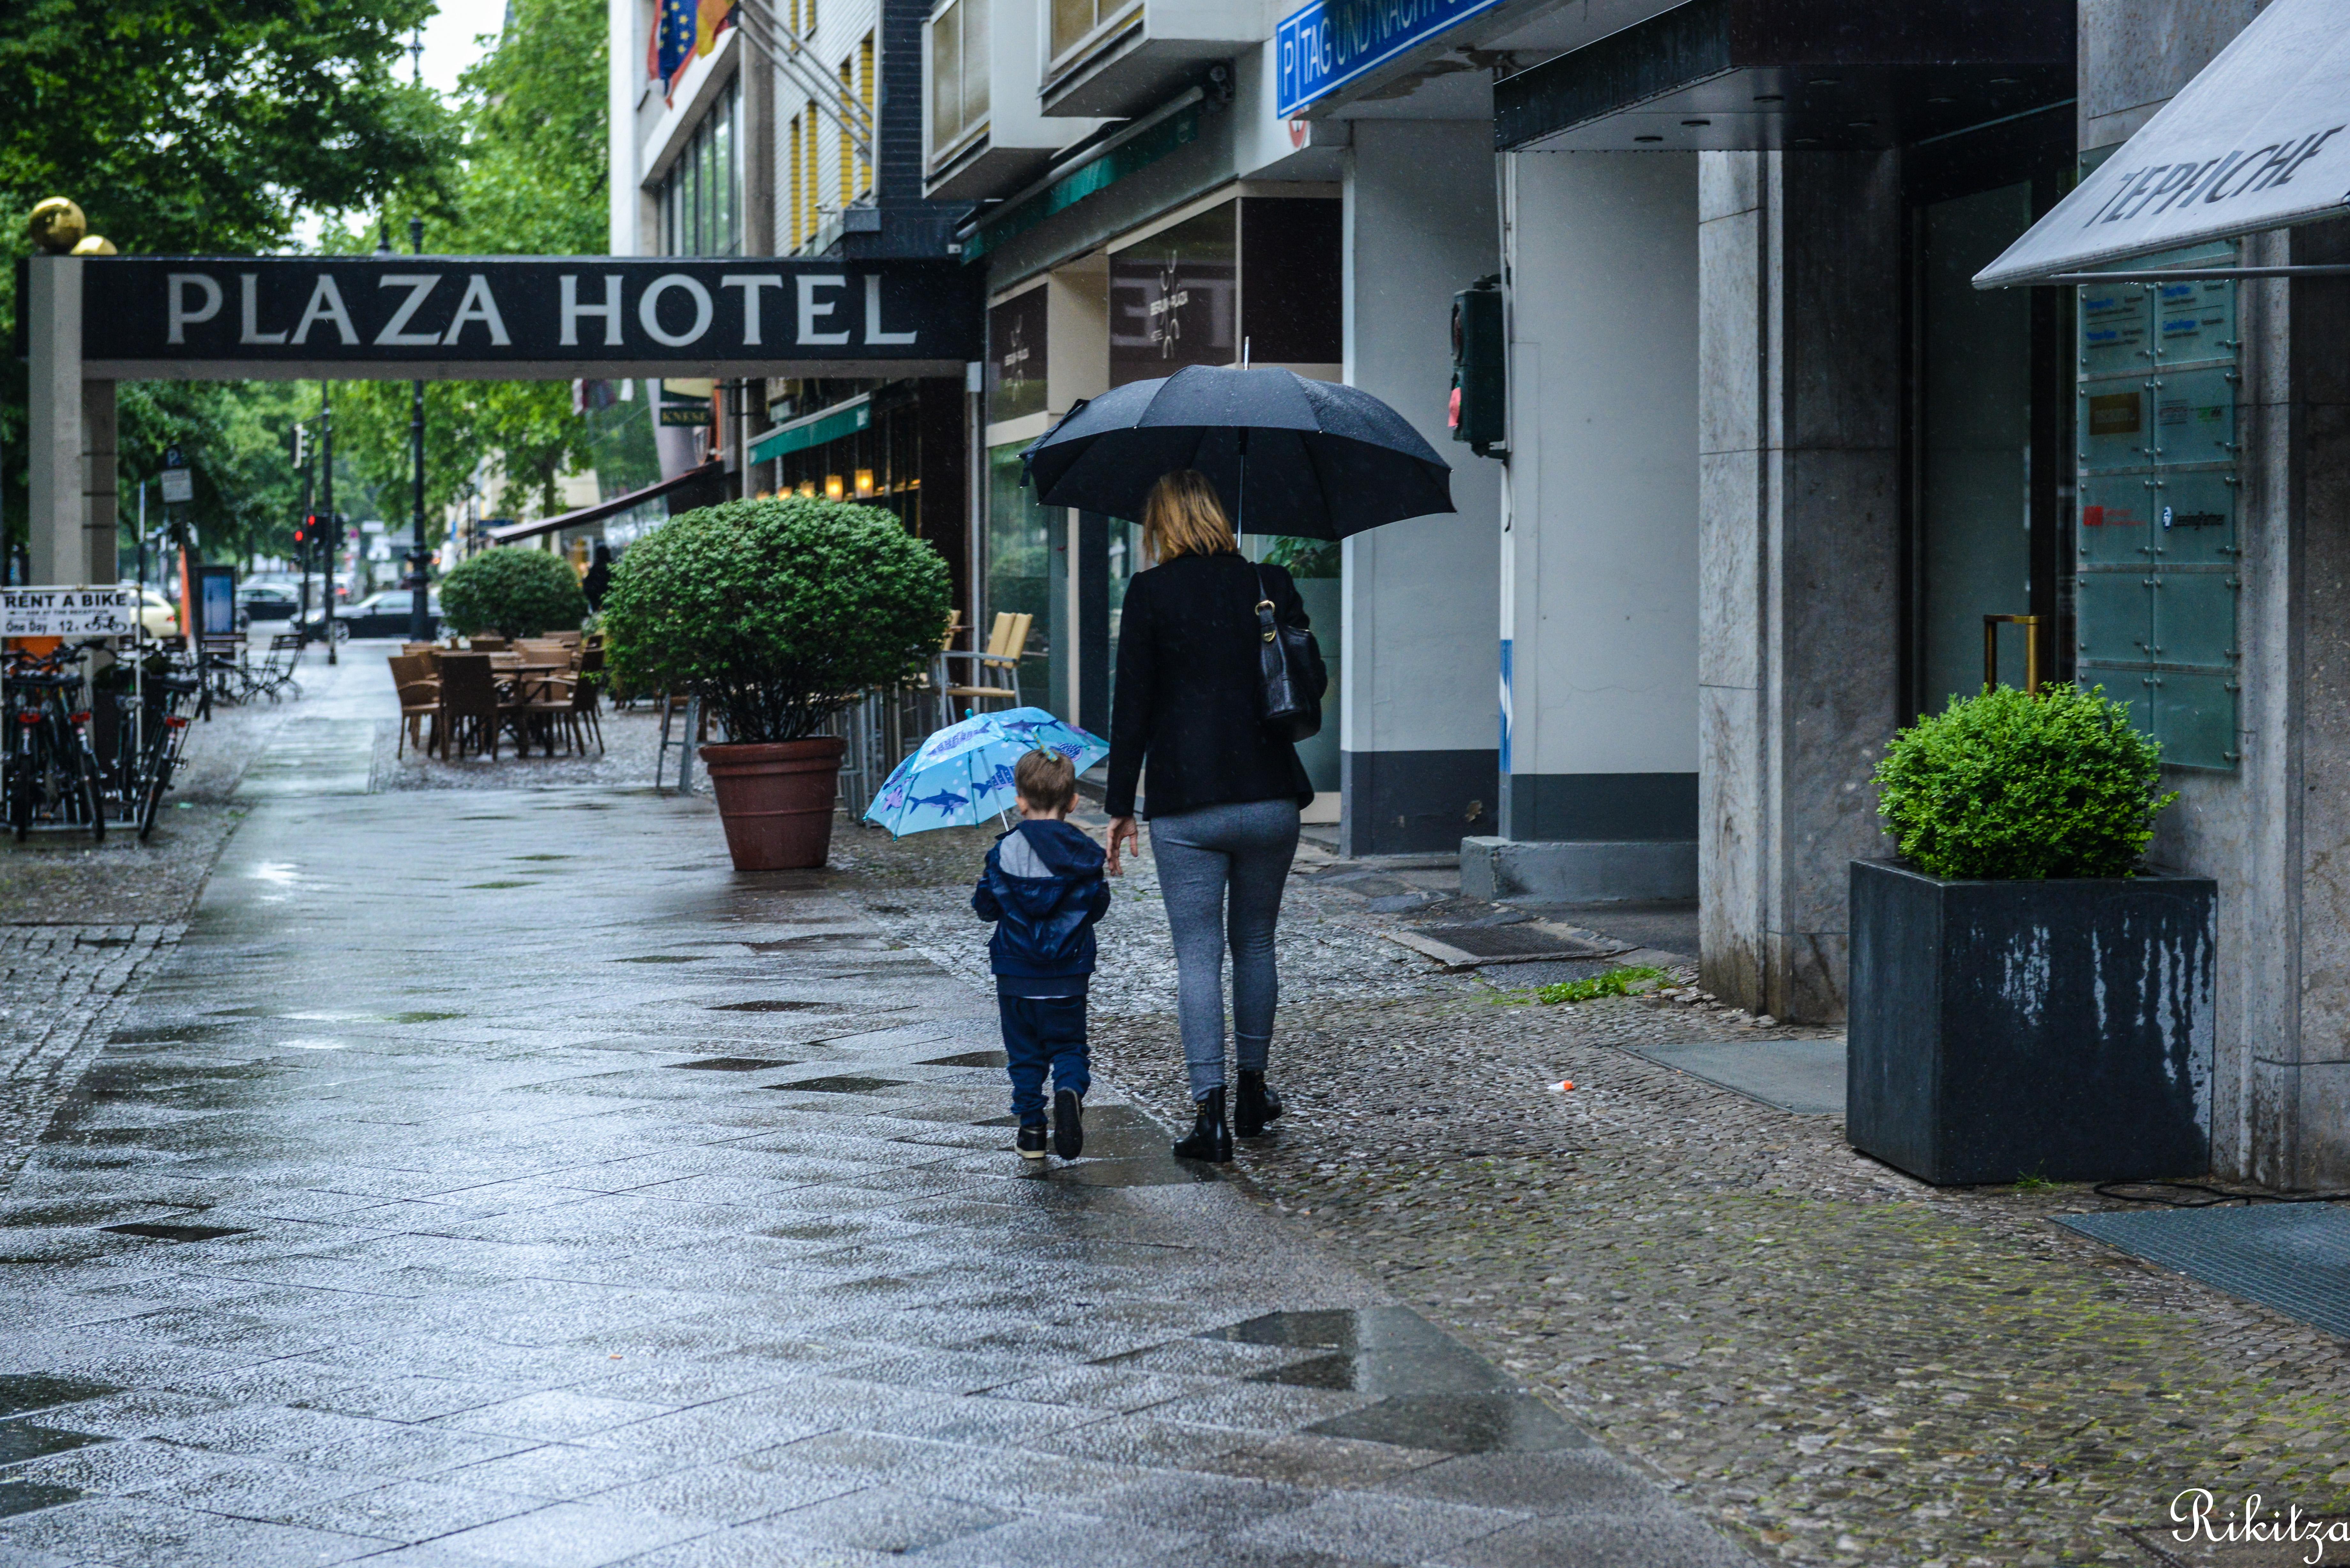 Hotel Plaza  Berlin by Rikitza